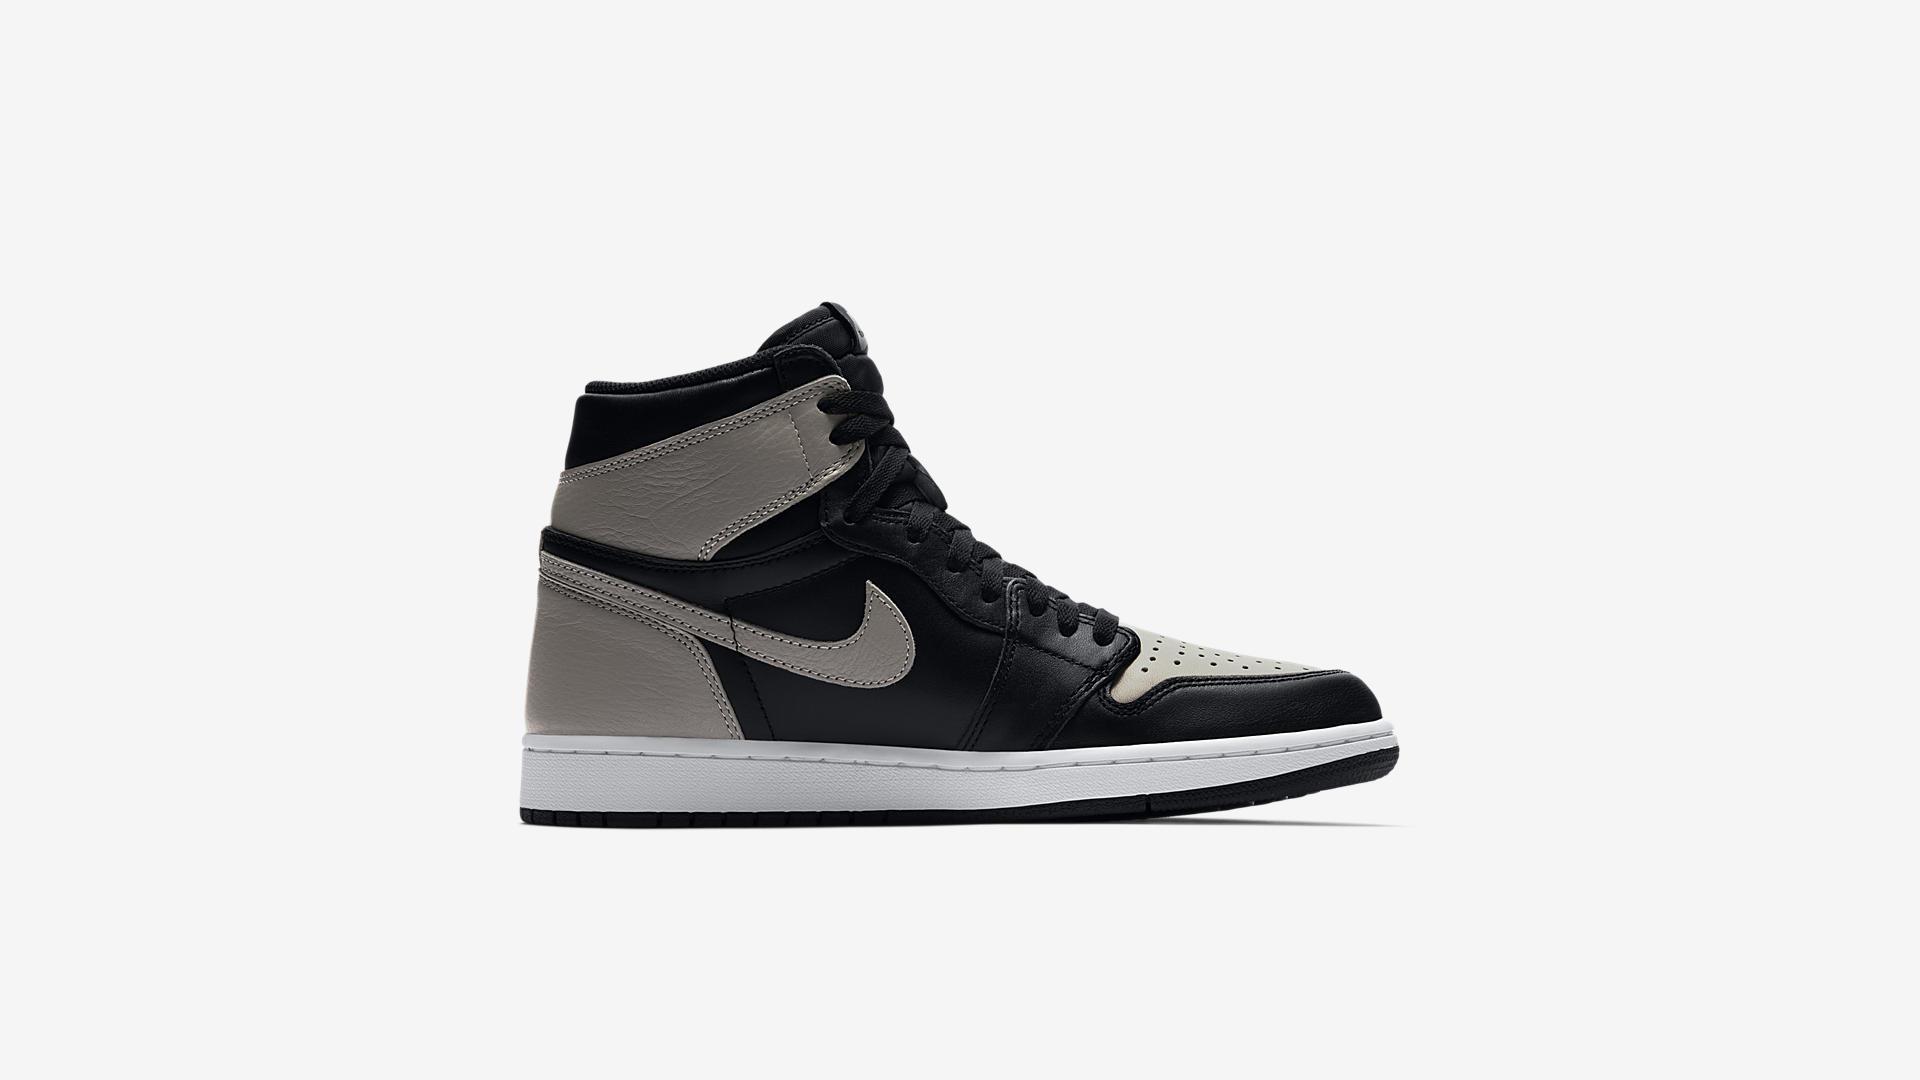 555088 013 Air Jordan 1 Retro High OG Shadow 3